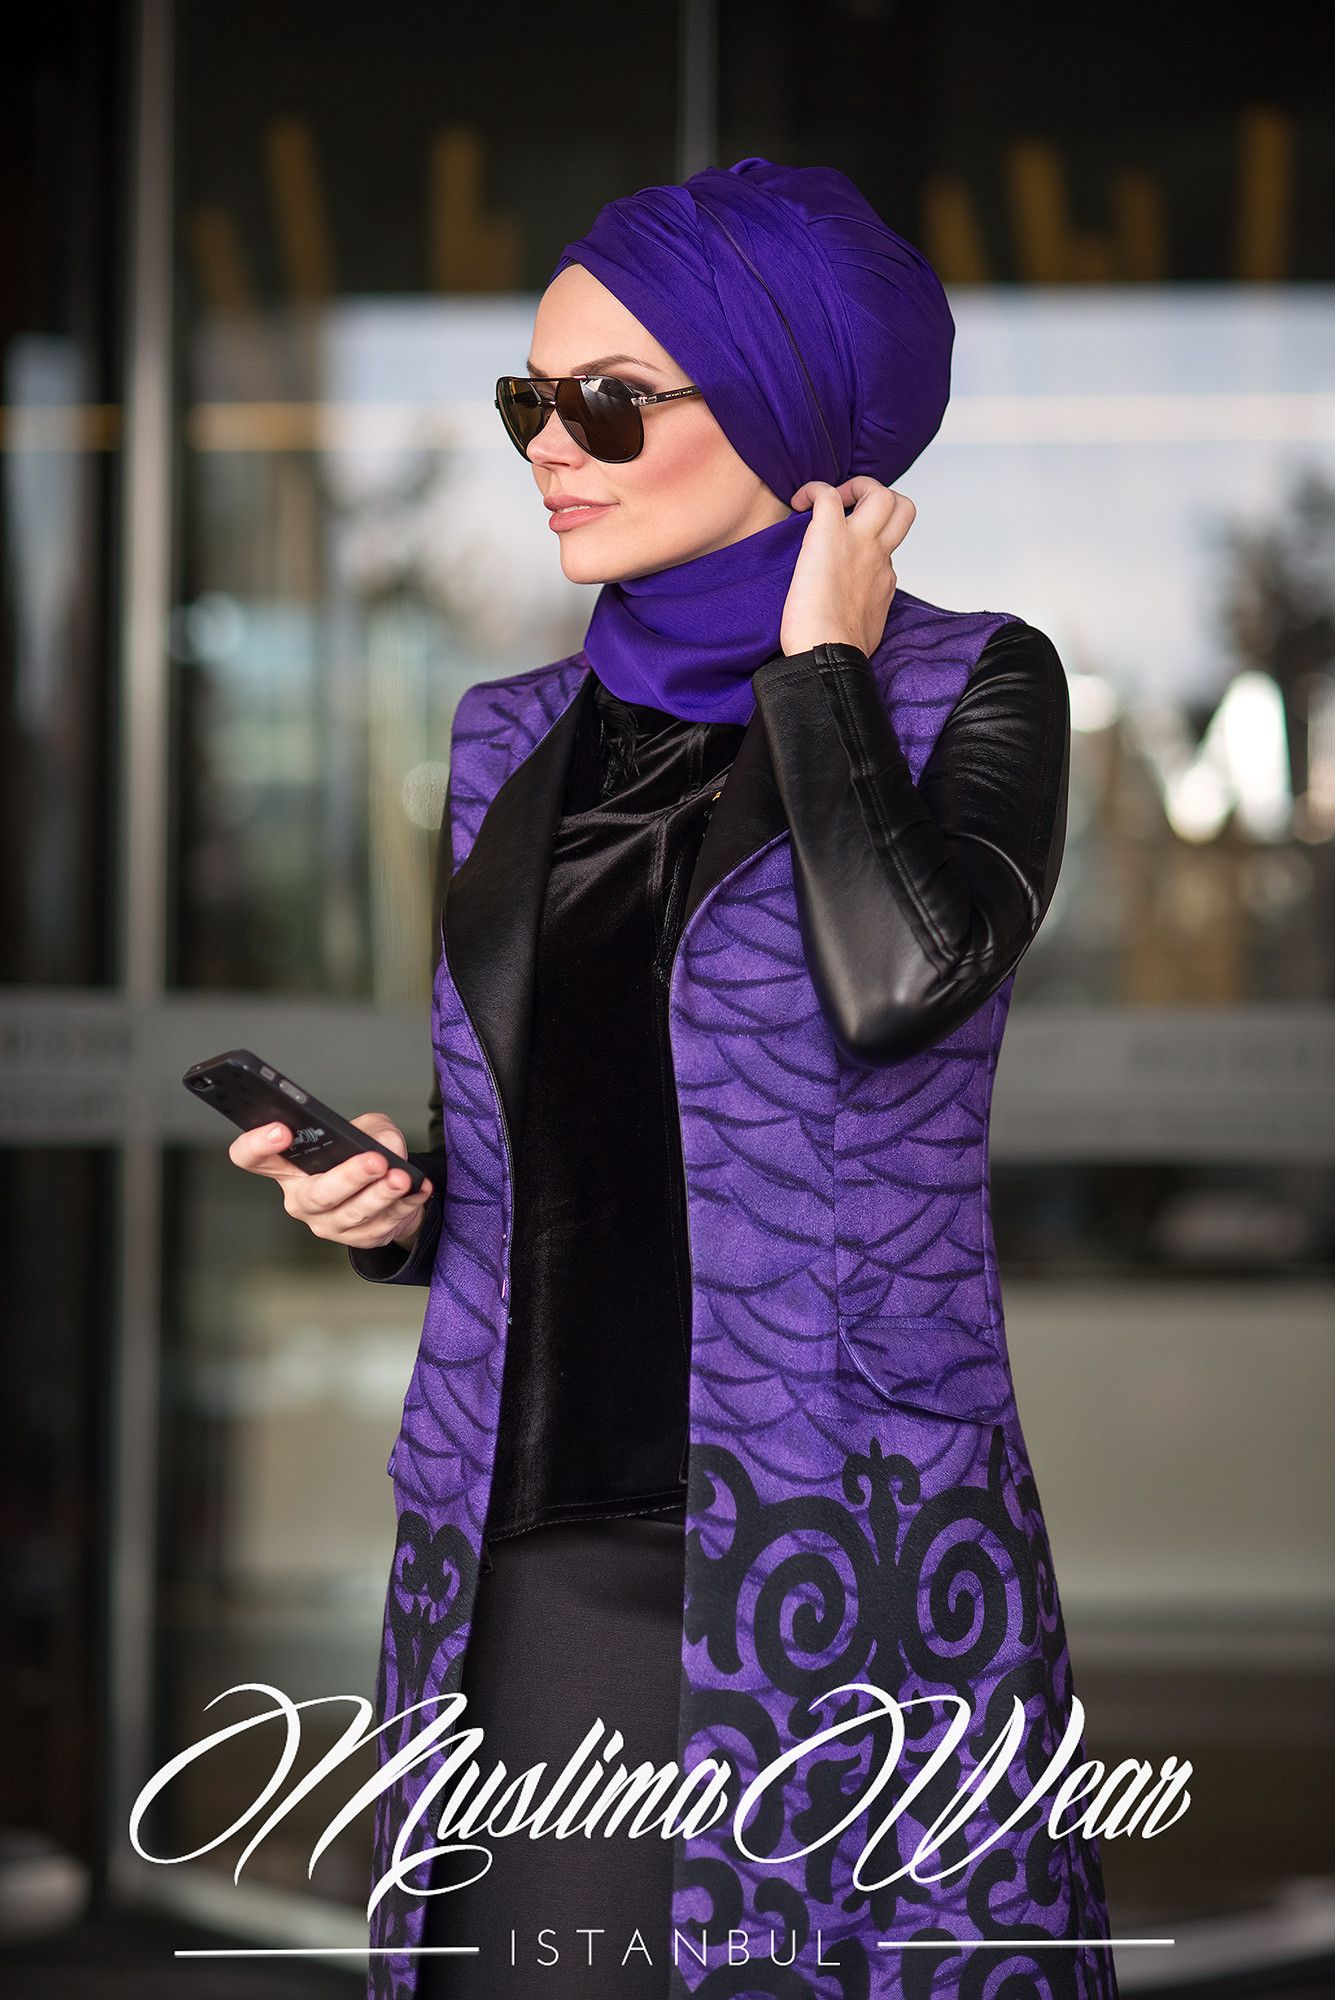 Muslima Wear-2016 VIOLA Waistcoat | Moda stilleri